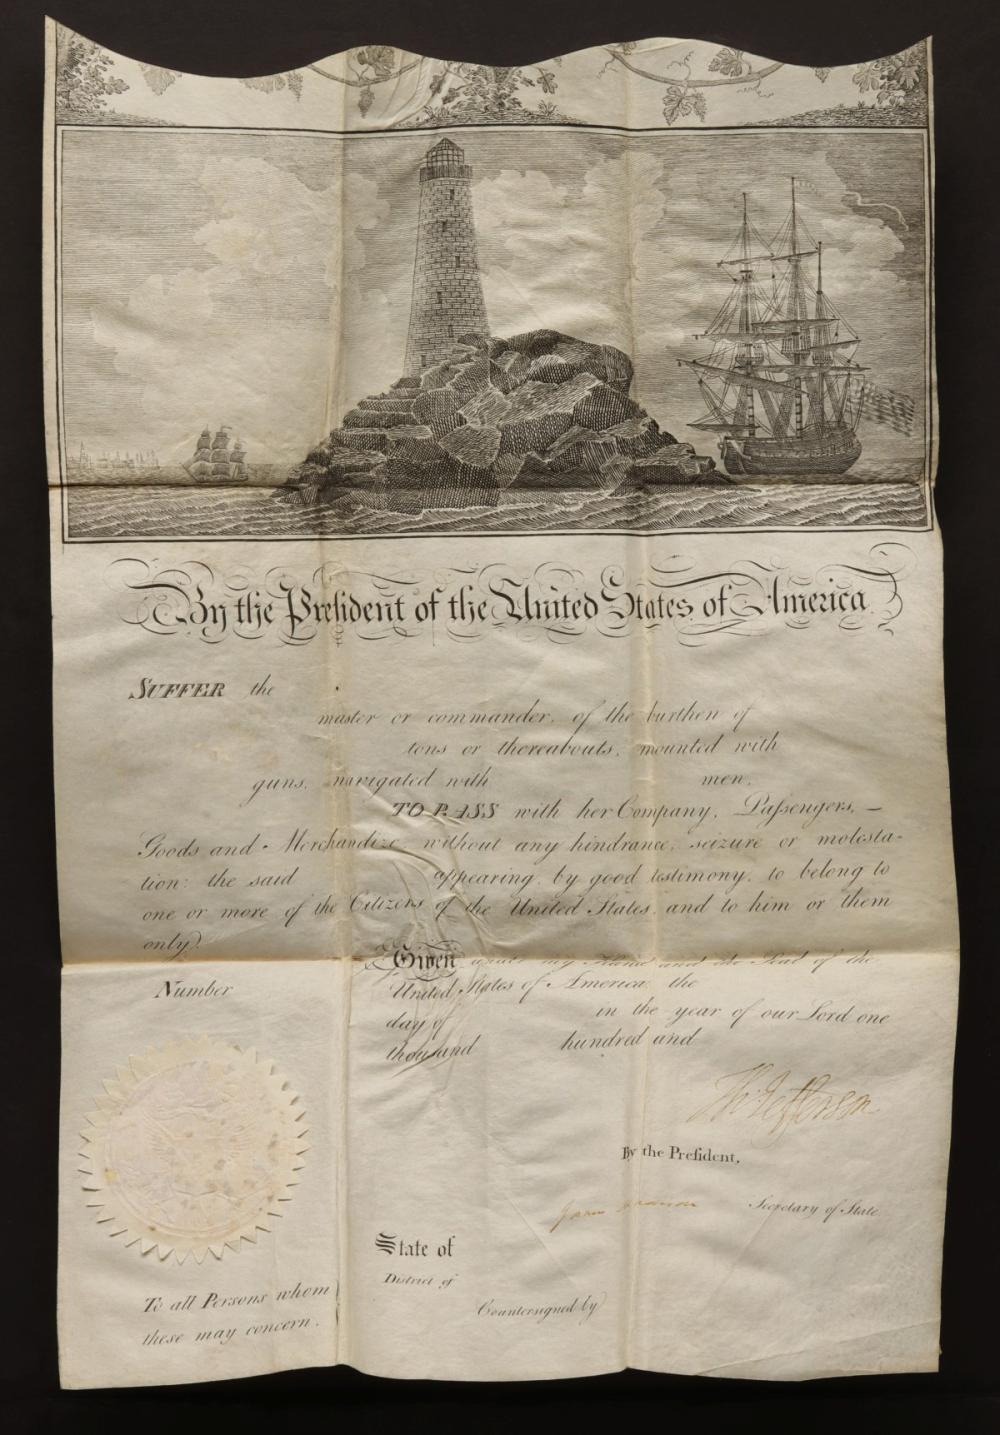 A SEA PASSPORT SIGNED THOMAS JEFFERSON & MADISON